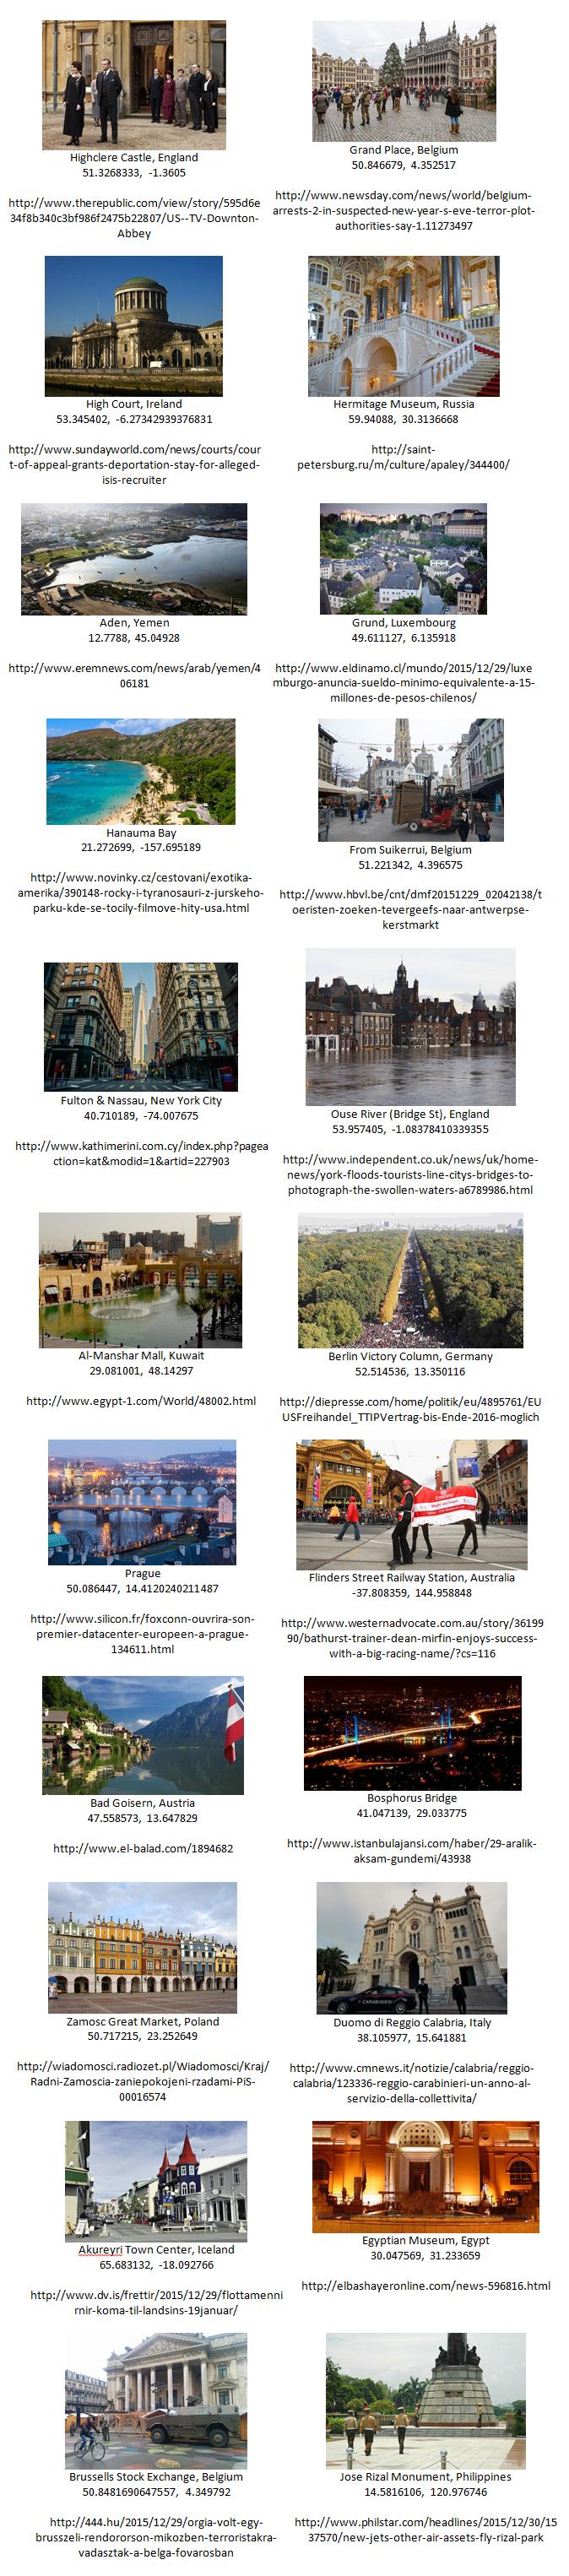 Landmarks-Vision-API-Examples